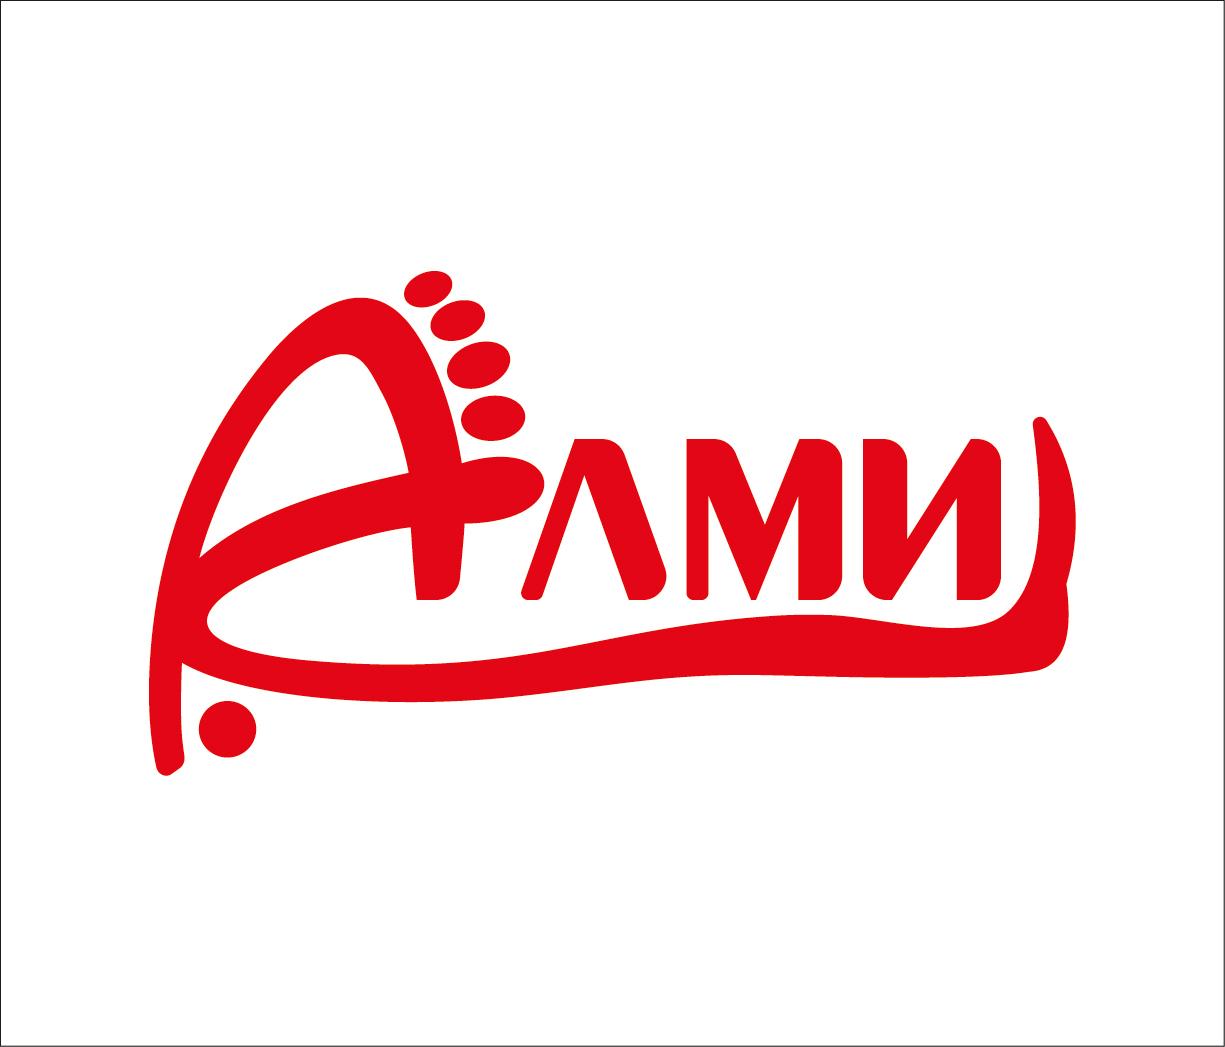 Дизайн логотипа обувной марки Алми фото f_11959f4524ac7182.jpg